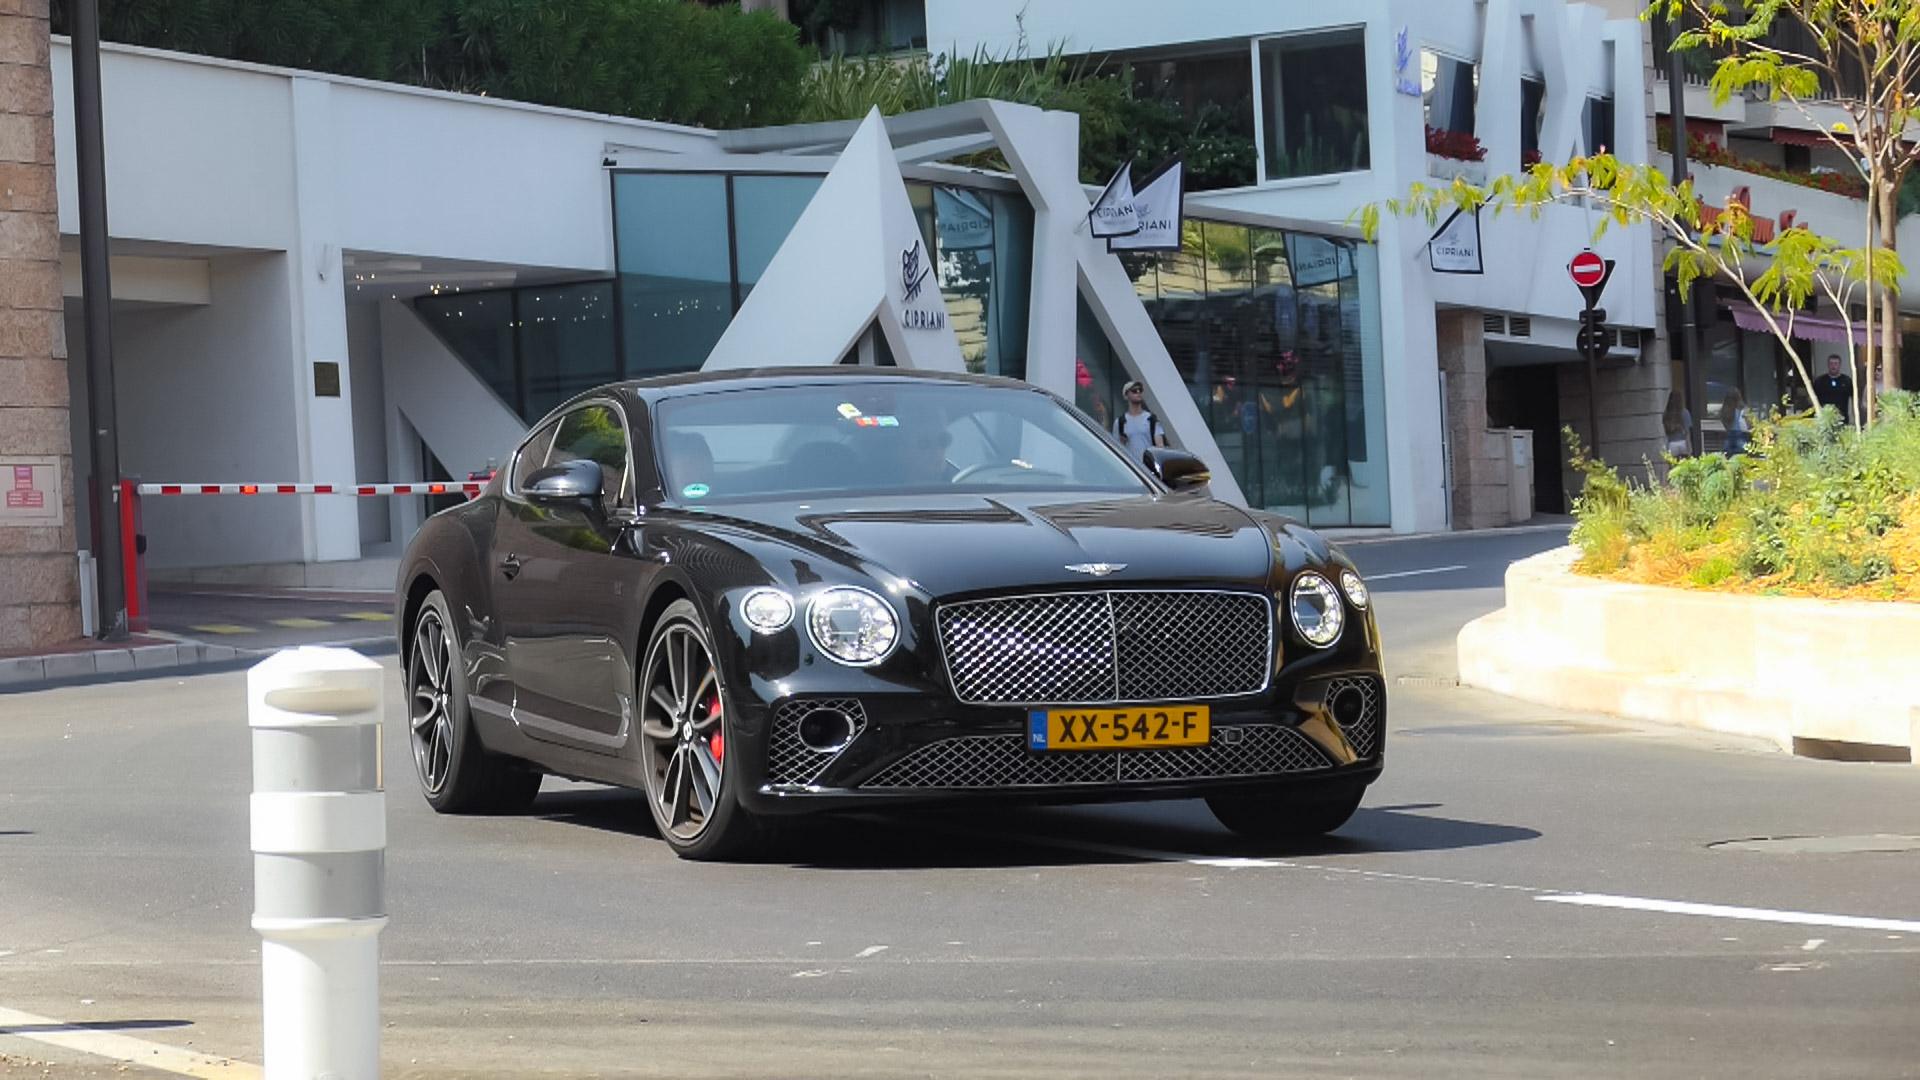 Bentley Continental GT - XX-542-F (NL)